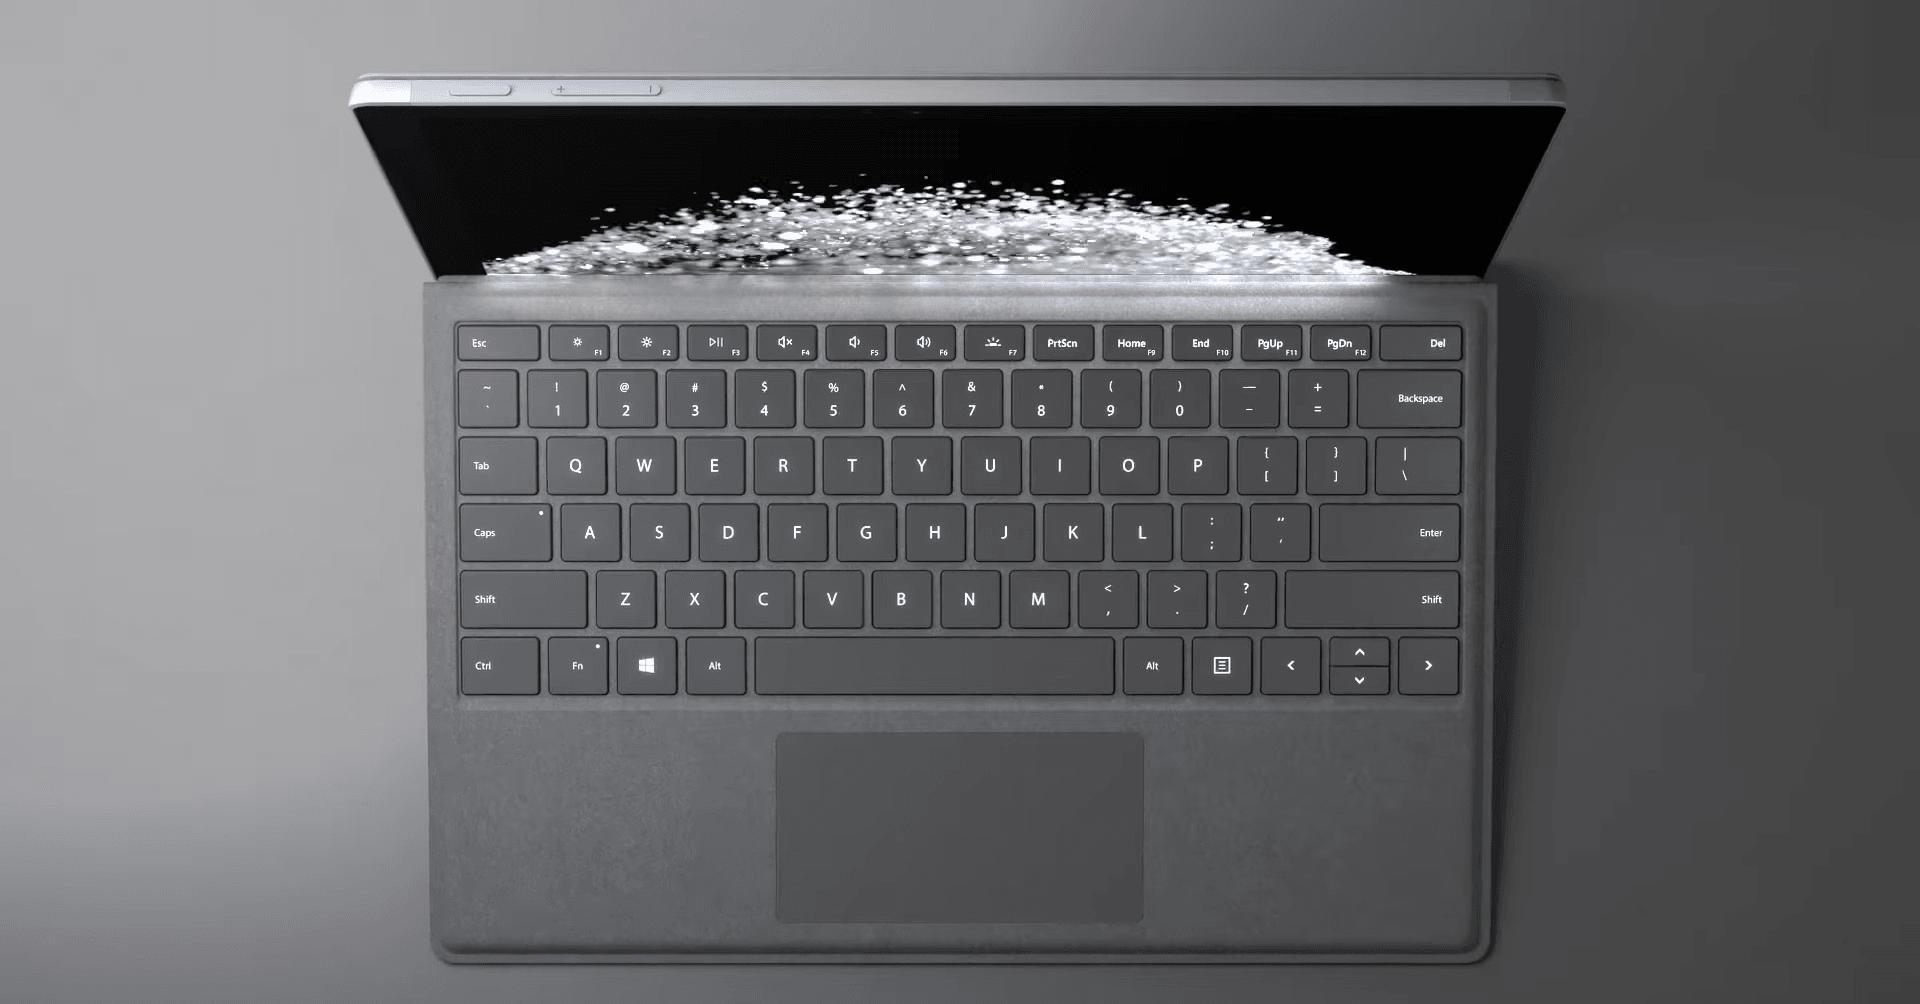 Obniżka cen sprzętu Microsoftu z procesorami Intel Core i5 - Surface Pro i Surface Laptop 1200 zł taniej 15